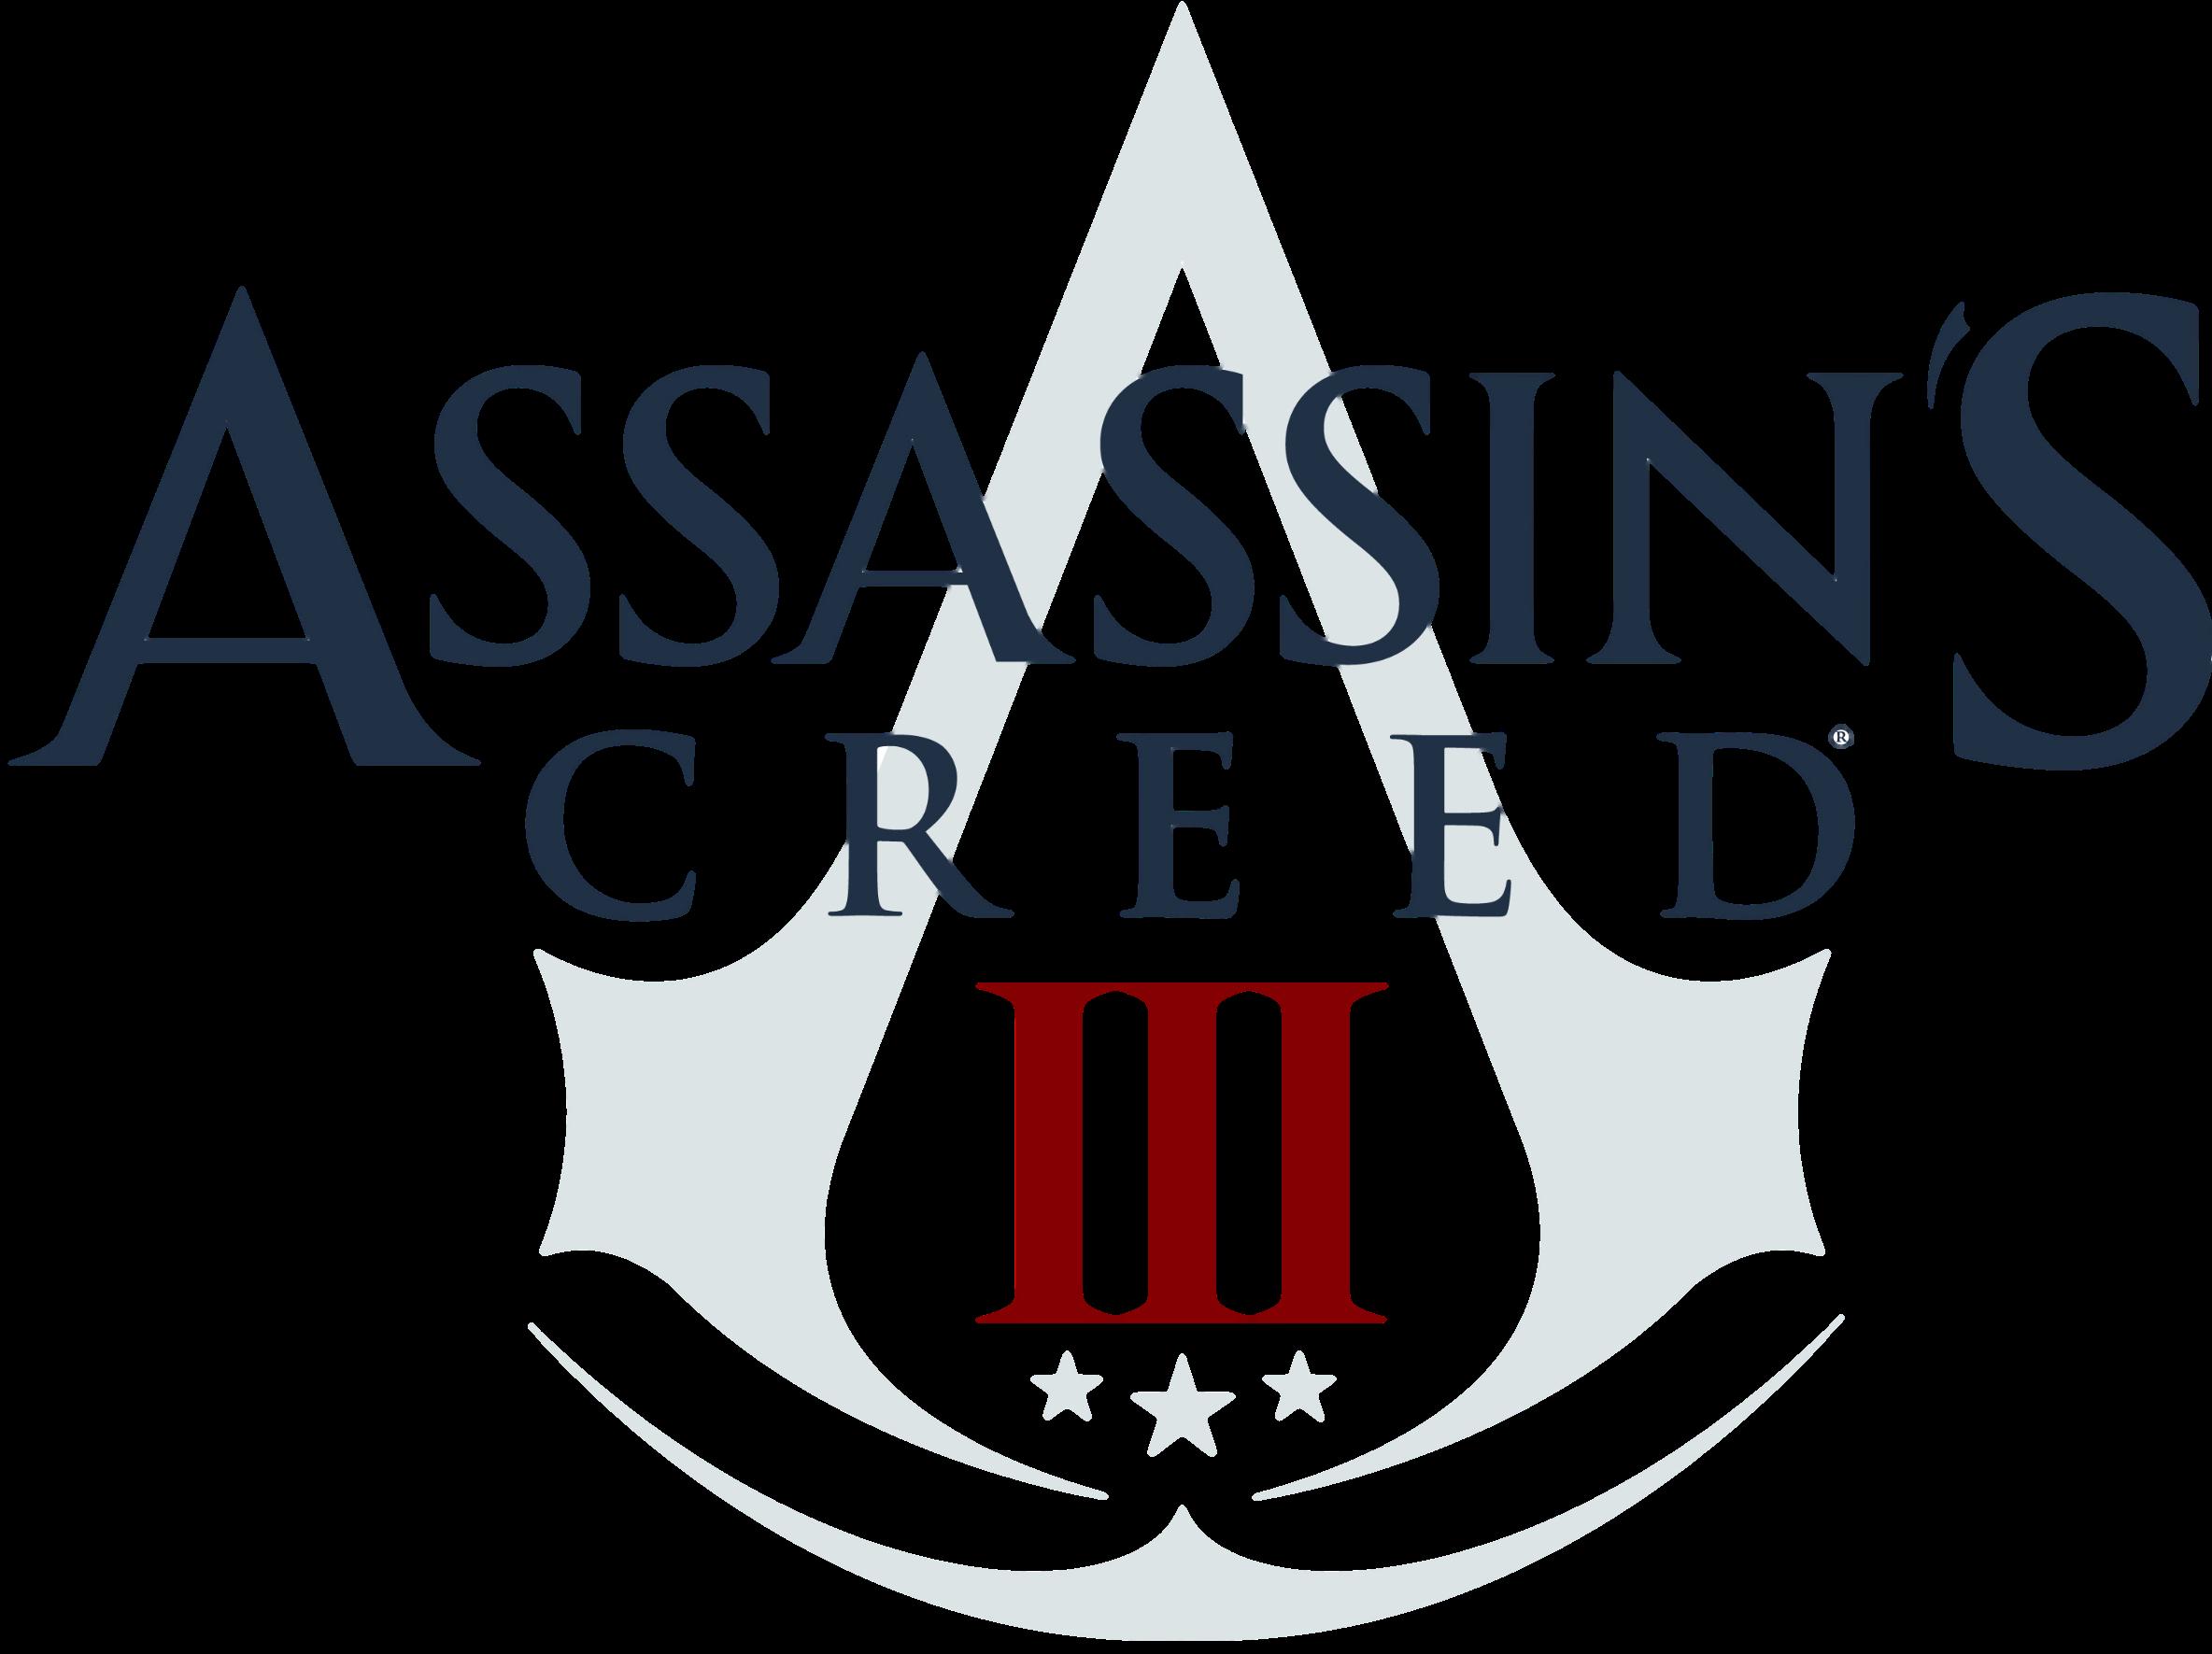 Assassin's Creed III - Assassin's Creed III diventa gratuito